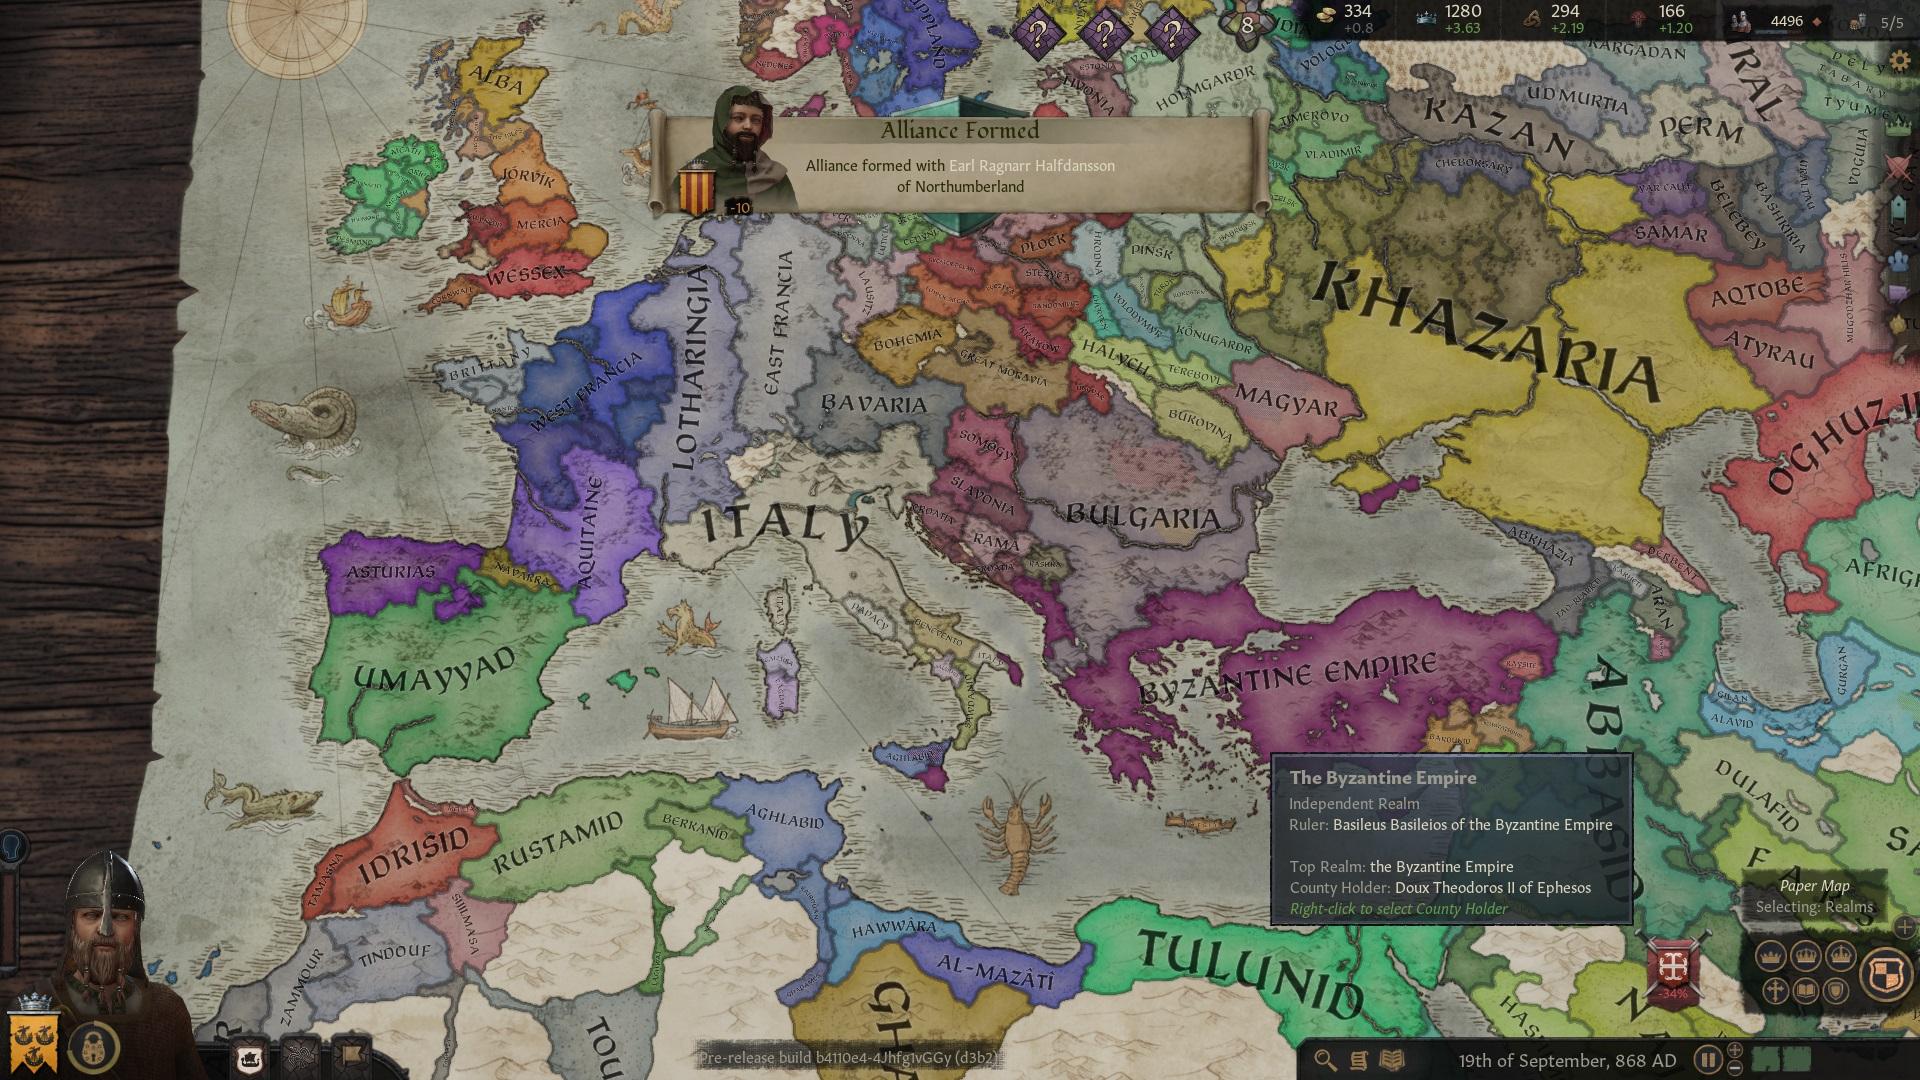 Crusader-Kings-3-Map-3